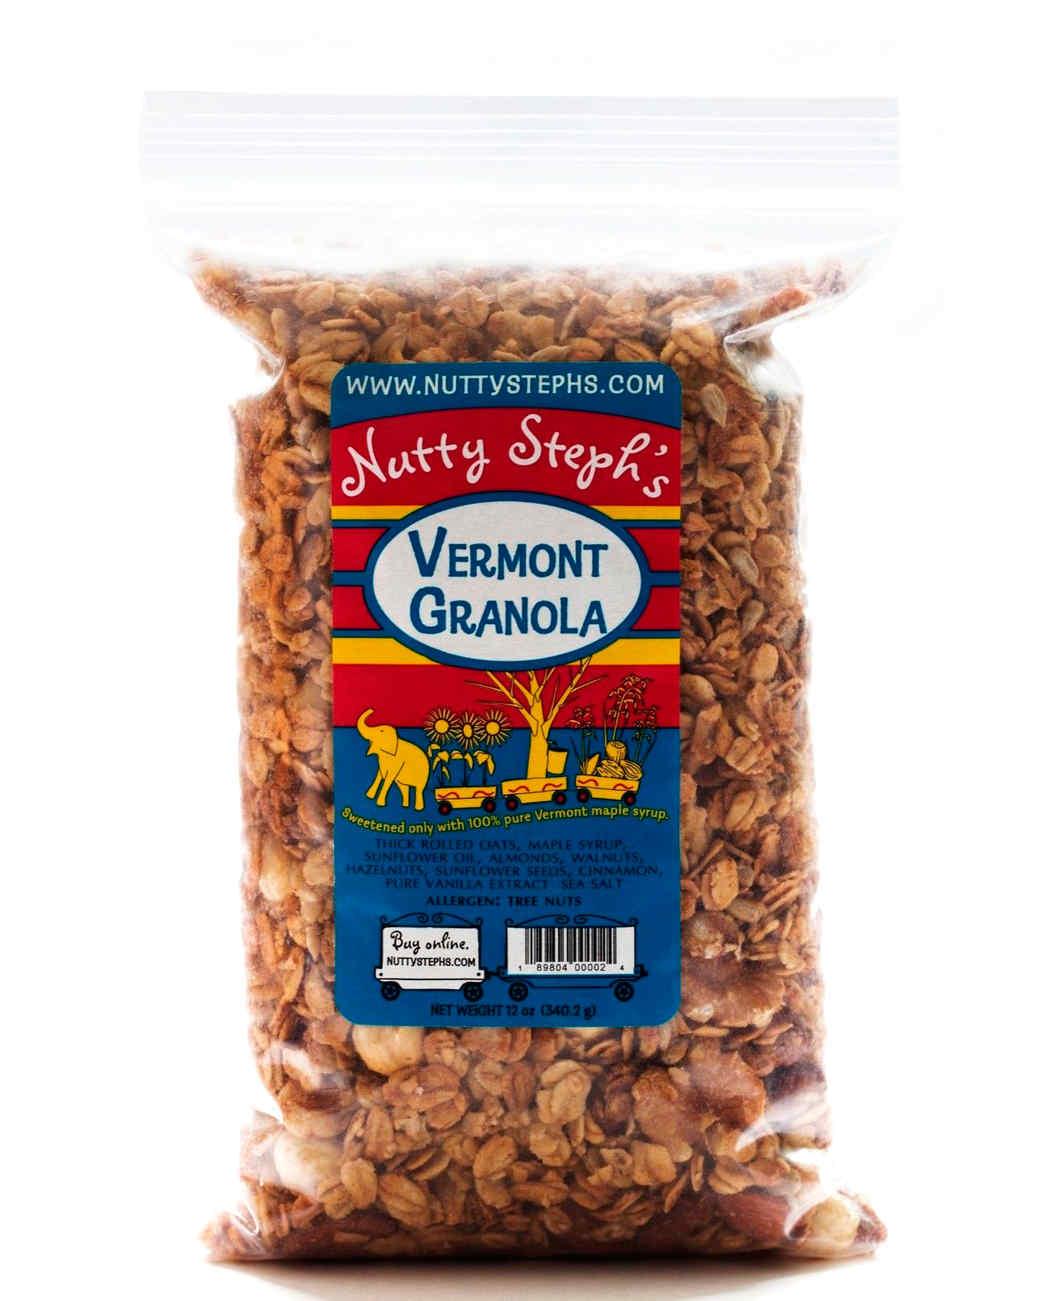 nutty-stephs-vermont-granola-12-oz-0914.jpg